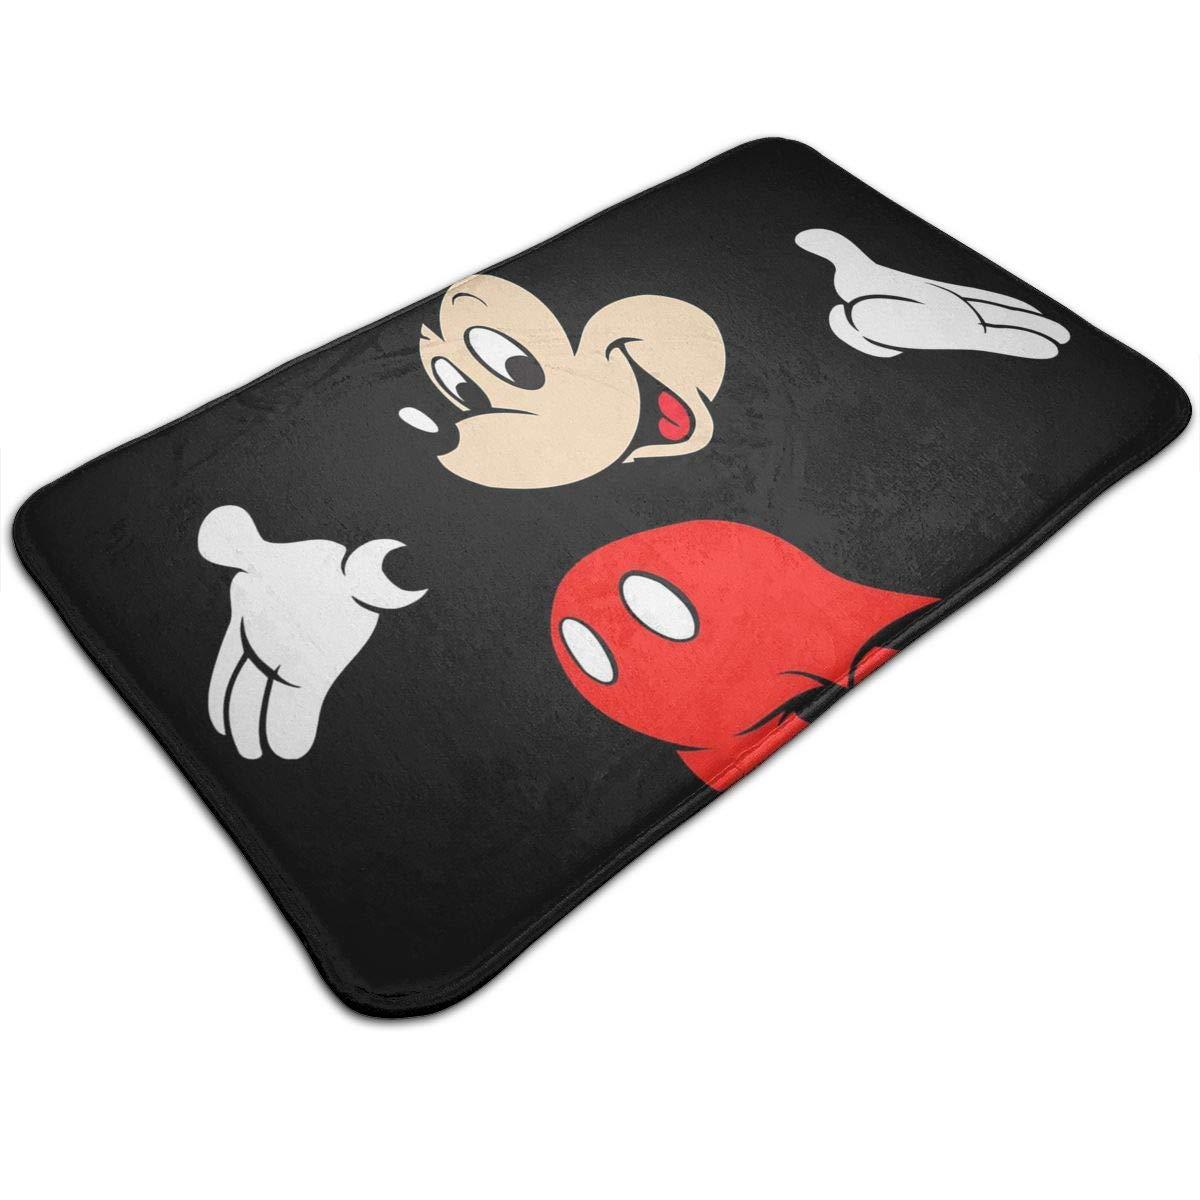 Xzcxyadd Bath Mat- Mickey Mouse Design, Non Slip Absorbs Soft Rug Carpet for Indoor Outdoor Patio